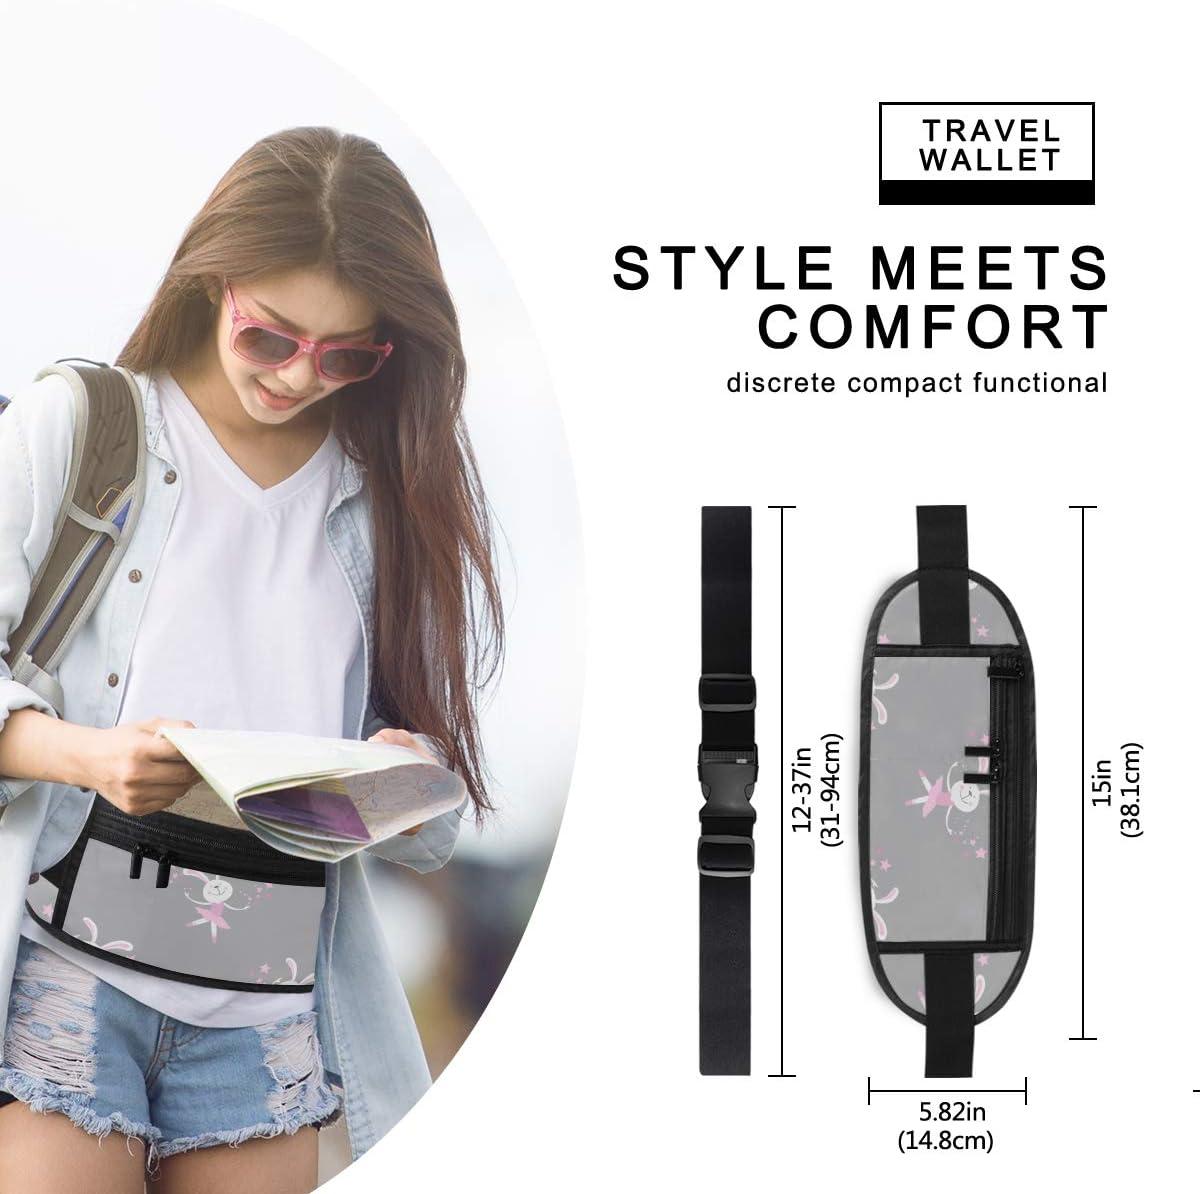 Travel Waist Pack,travel Pocket With Adjustable Belt Cute Rabbit Ballerina Pattern Running Lumbar Pack For Travel Outdoor Sports Walking